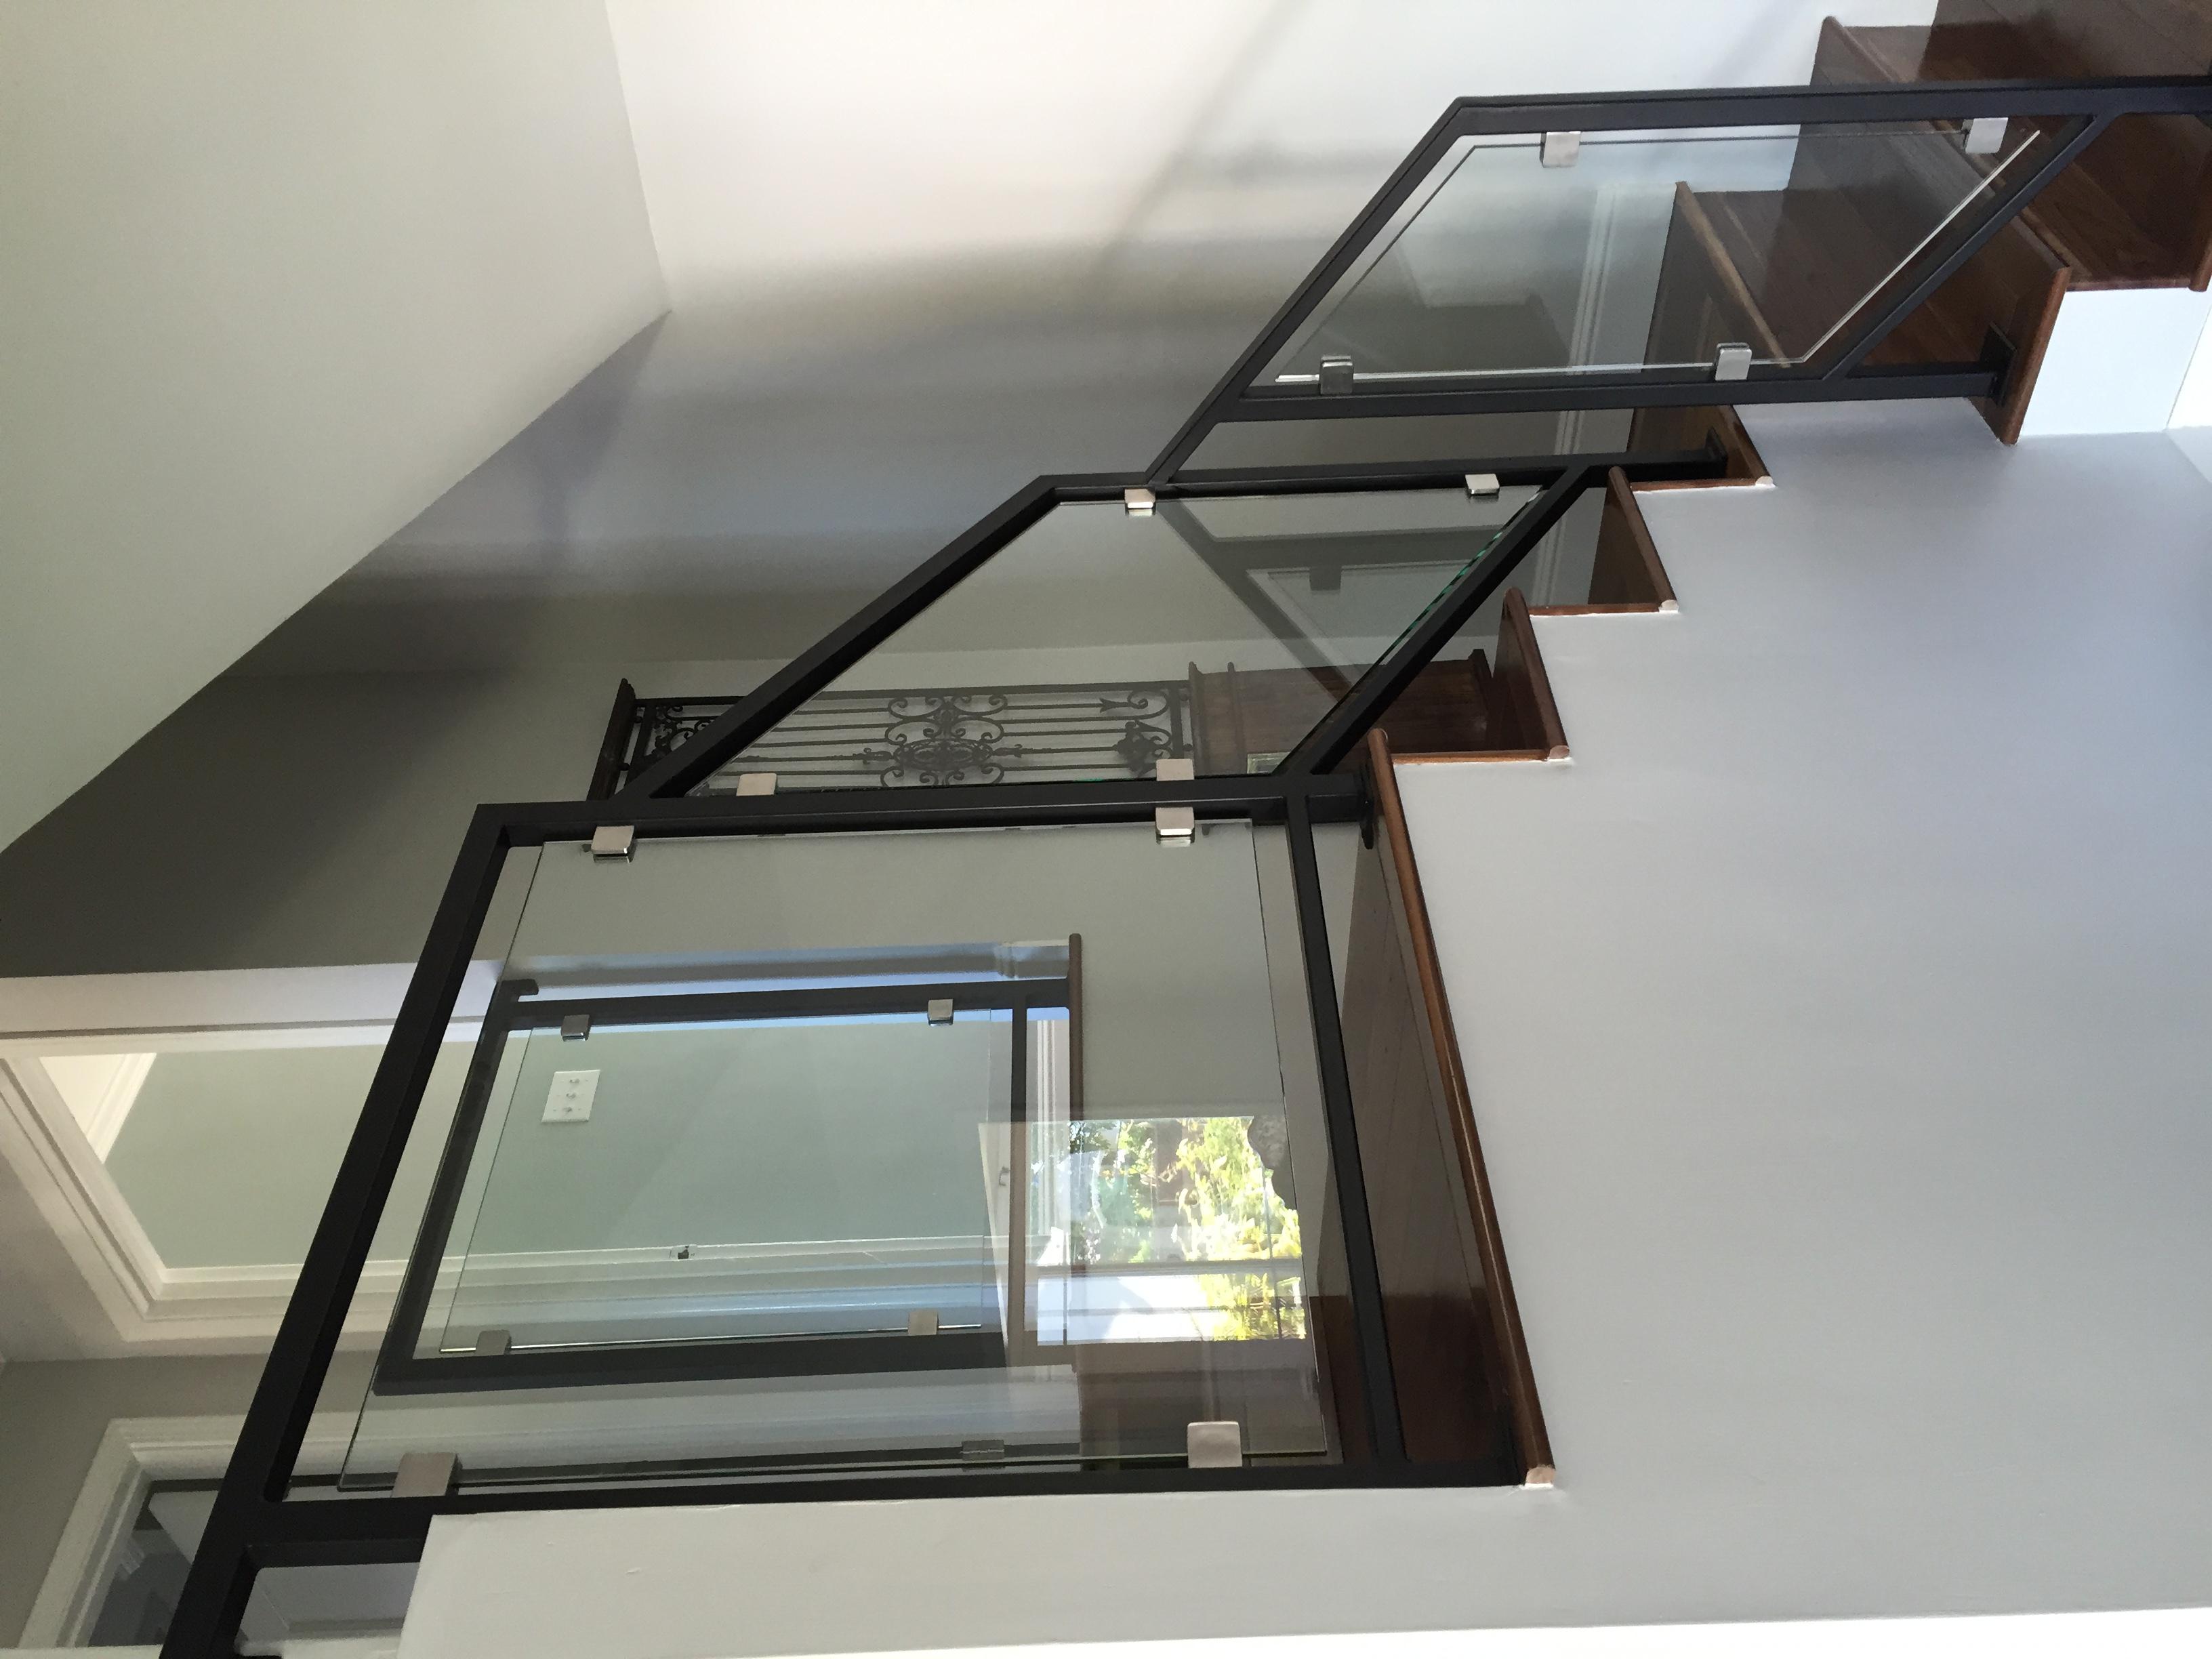 railing0001122.jpg